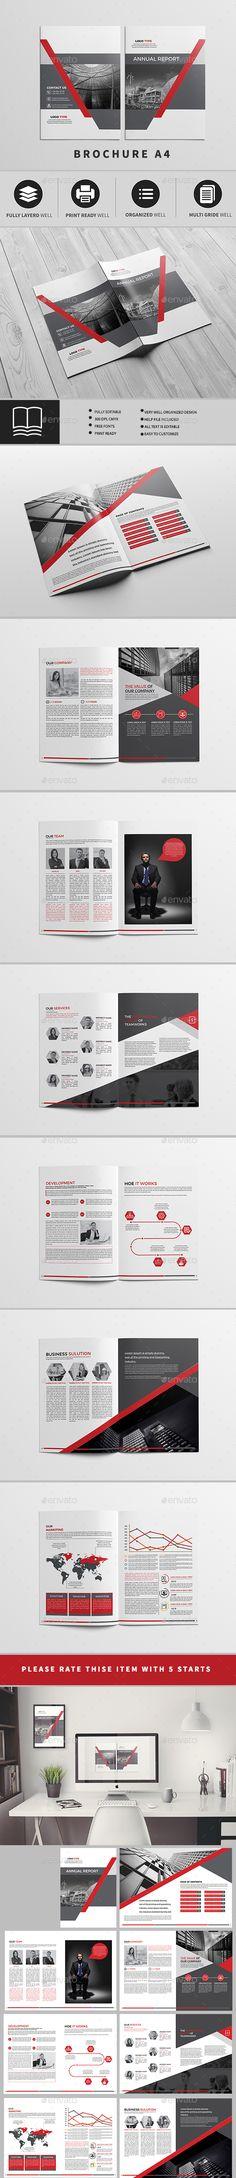 Annual Report Brochure - #Brochures Print Templates Download here: https://graphicriver.net/item/annual-report-brochure/19420231?ref=alena994